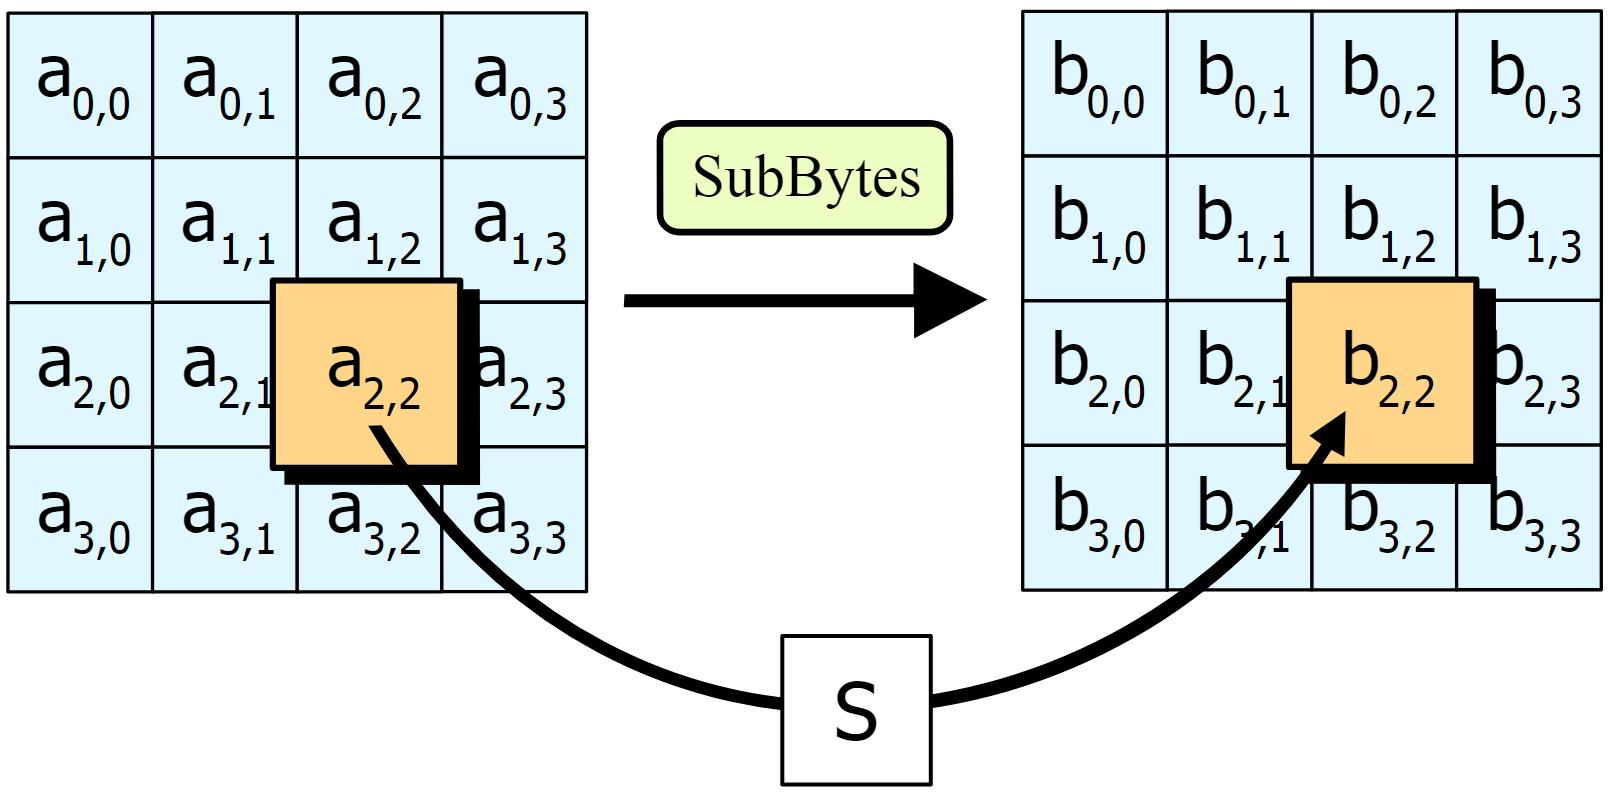 eabcd90ac29 АНБ предложило стандарт шифрования для устройств Интернета вещей